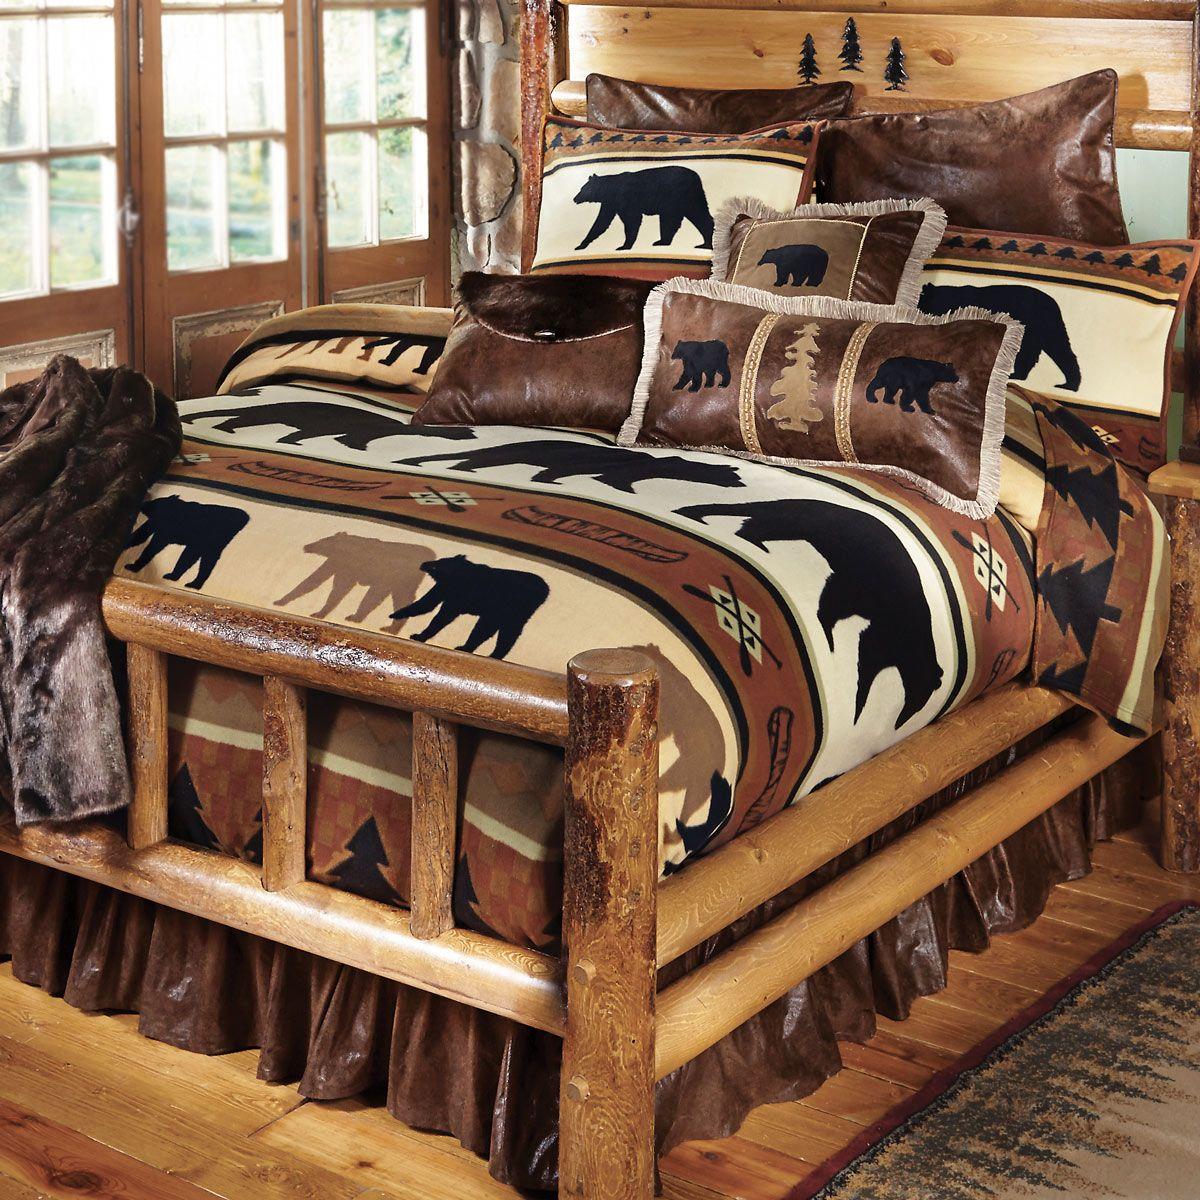 Black Bear River Plush Blanket Queen Cabin Decor Black Bear Decor Black Forest Decor